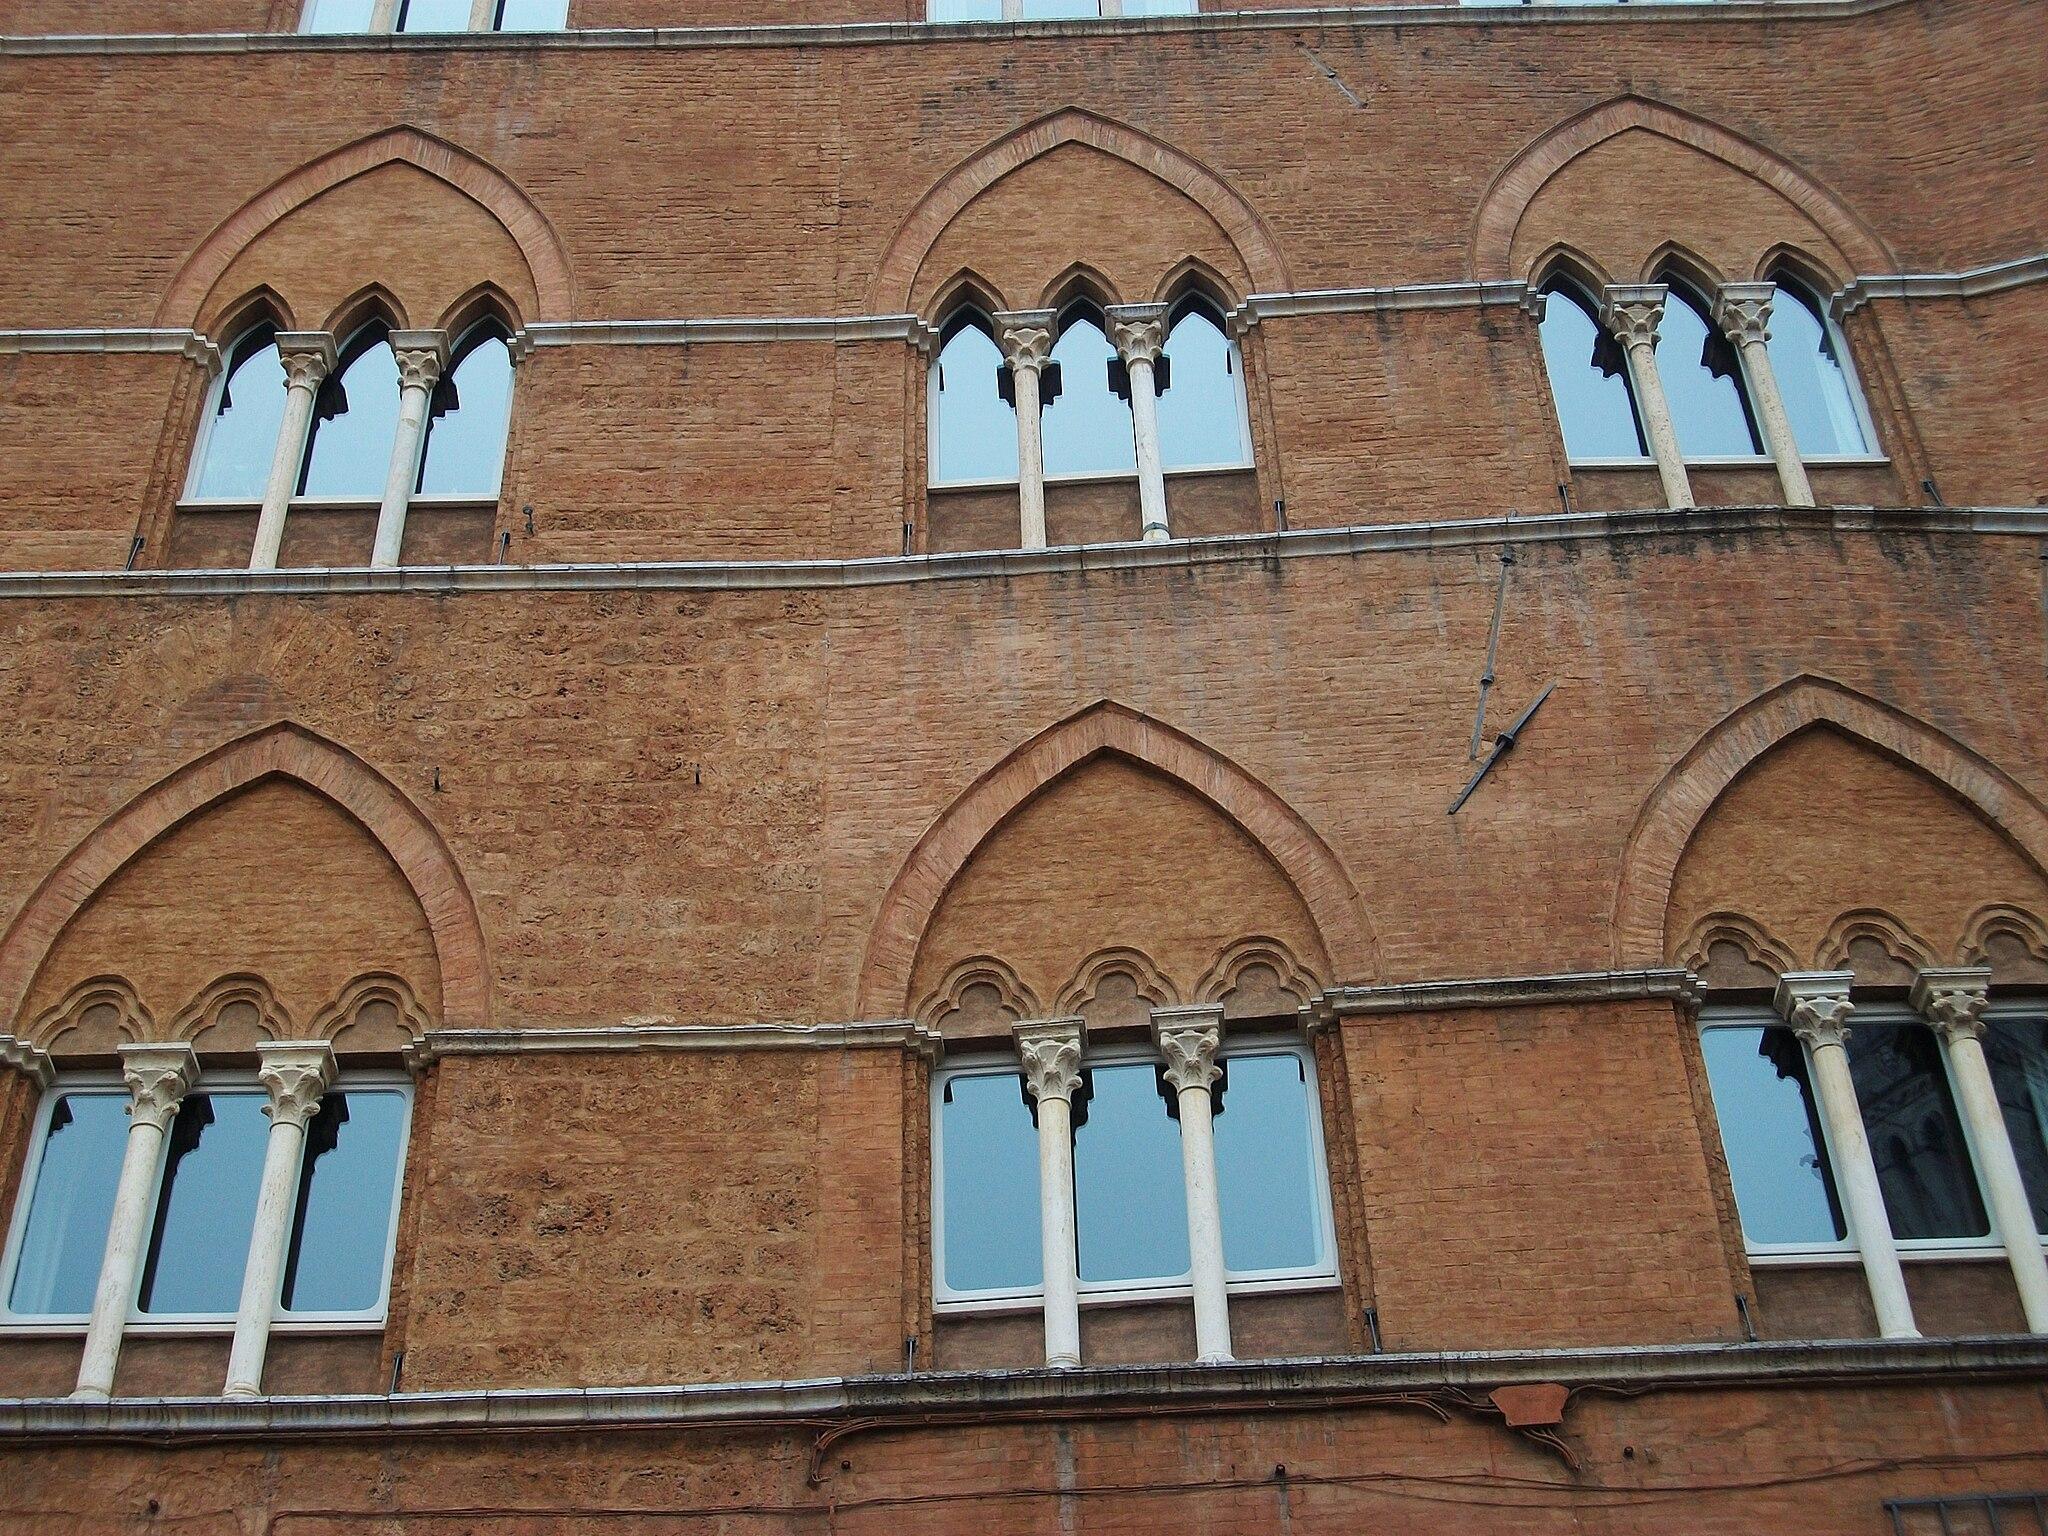 Finestres del Palau Sansedoni de Siena